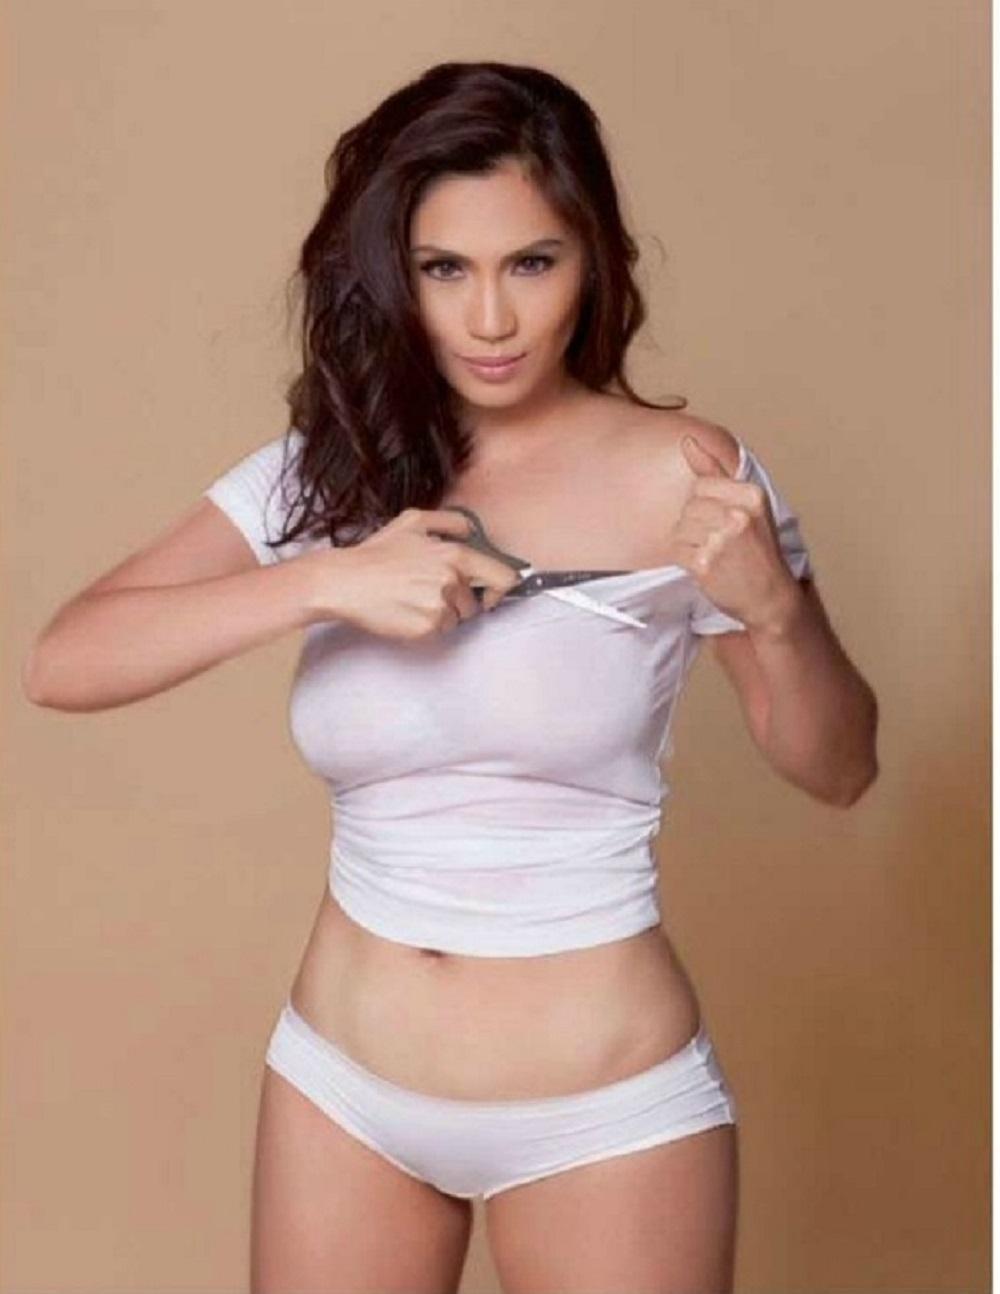 diana zubiri sexy fhm topless pics 04